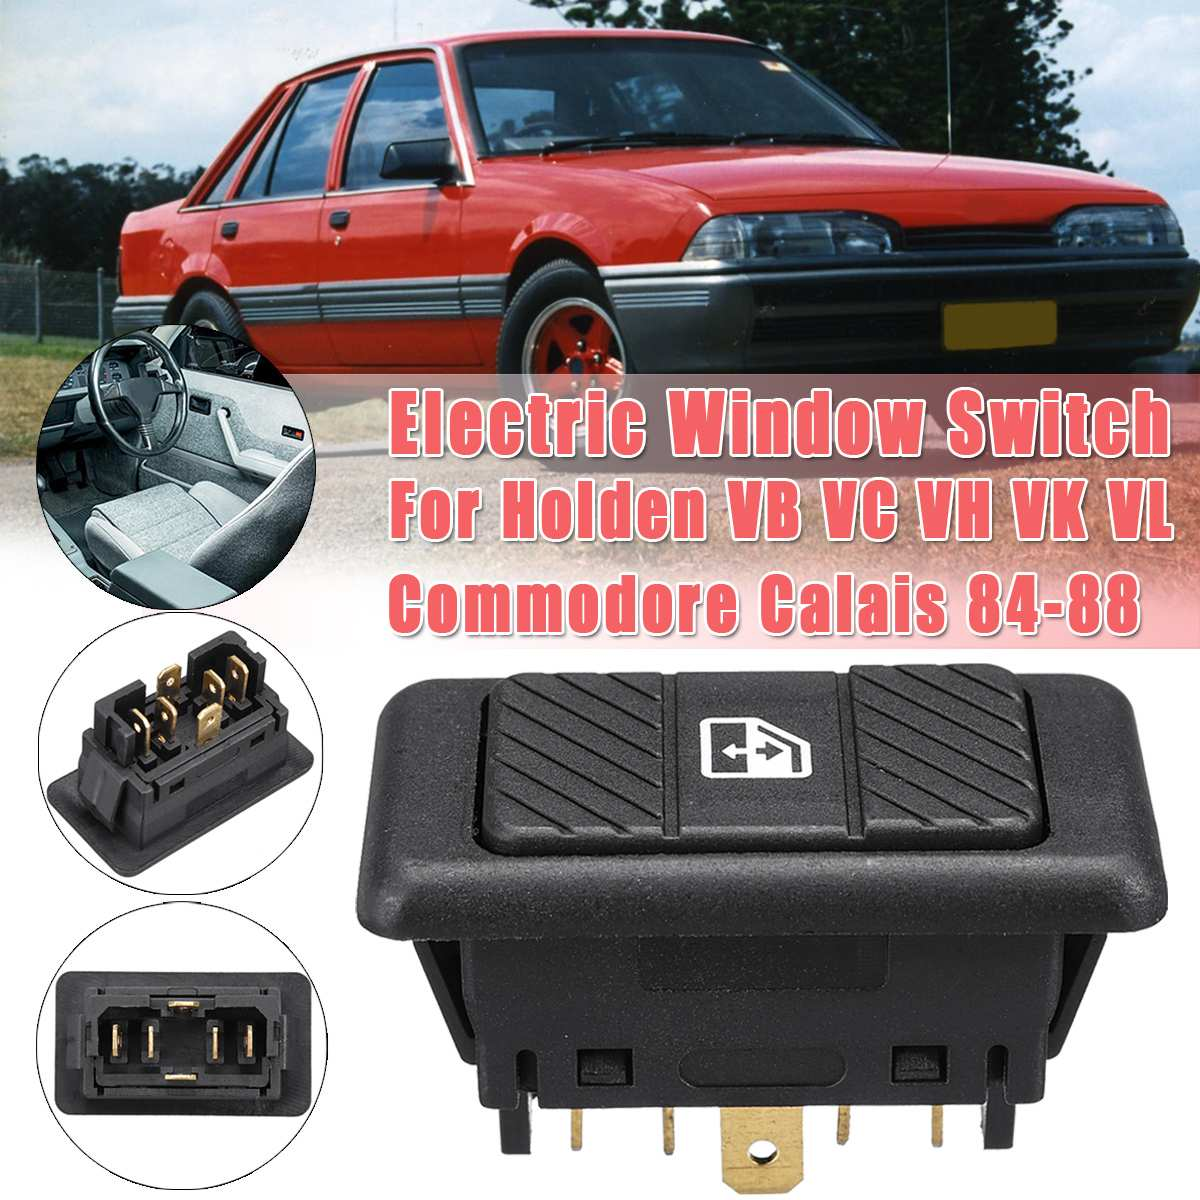 Interruptor de palanca de la ventana eléctrica del coche de 6 pines para Holden VB VC VH VK VL Commodore Calais 84-88 BWASWPW04